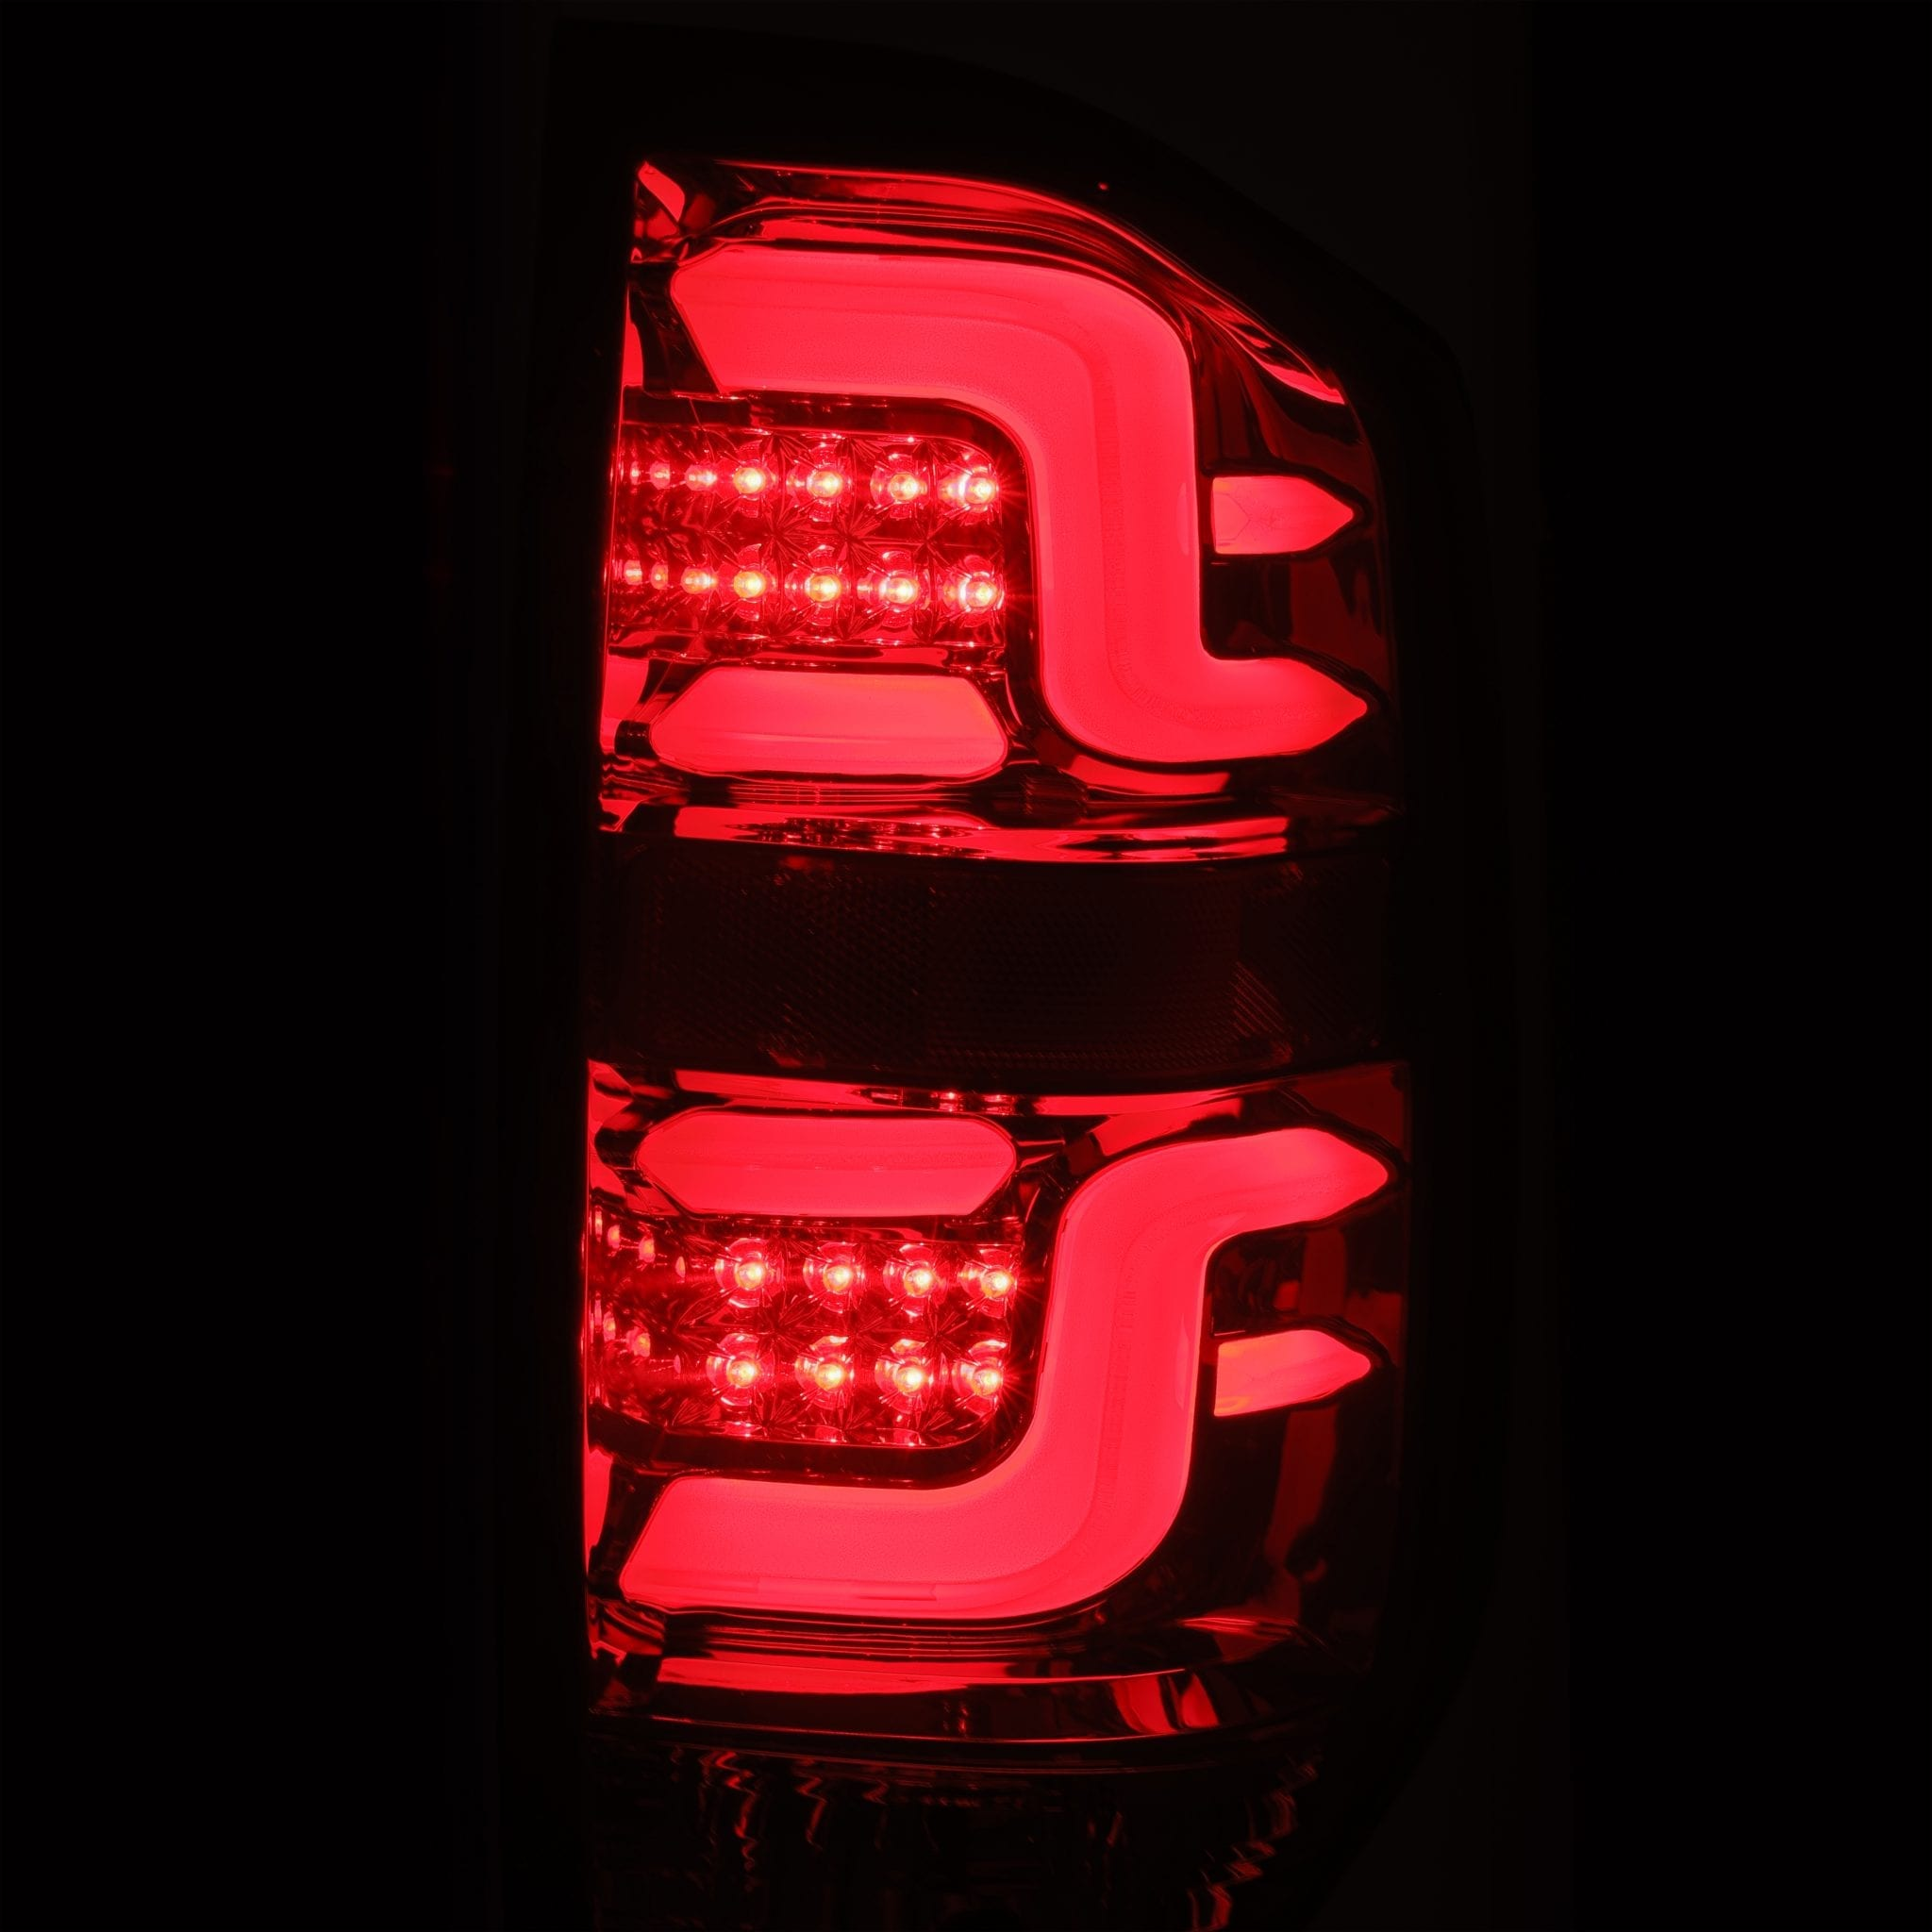 2014 2015 2016 2017 2018 2019 2020 Toyota Tundra PRO-Series LED Tail Lights Red Smoke